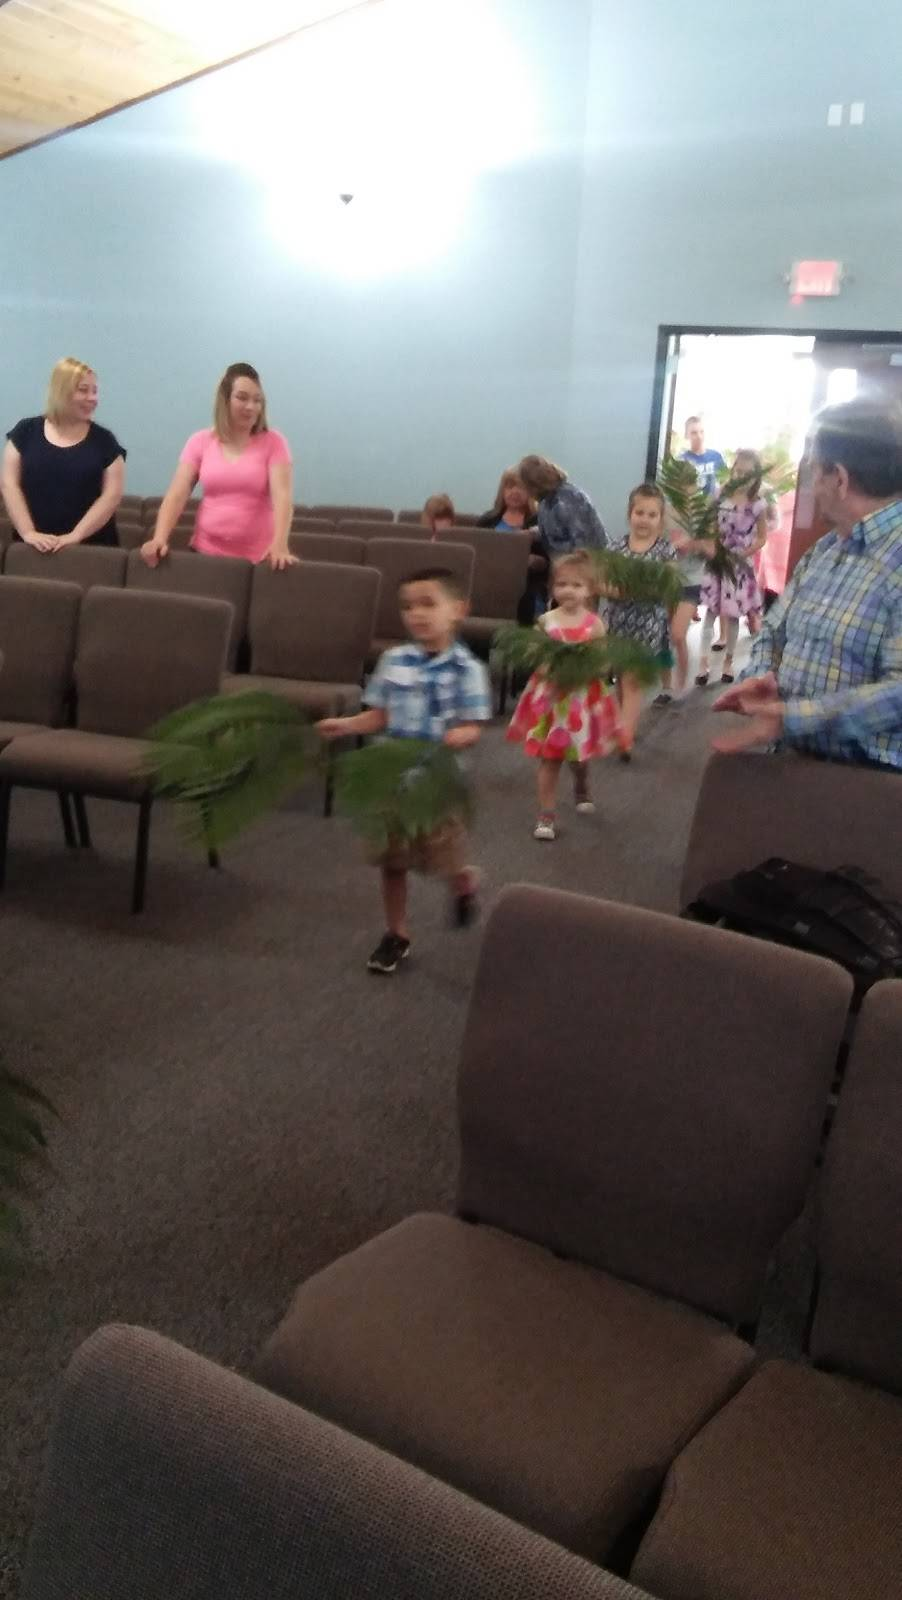 Cedar View General Baptist Church - church  | Photo 9 of 9 | Address: 3716 Ruth Dr, Granite City, IL 62040, USA | Phone: (618) 931-5330